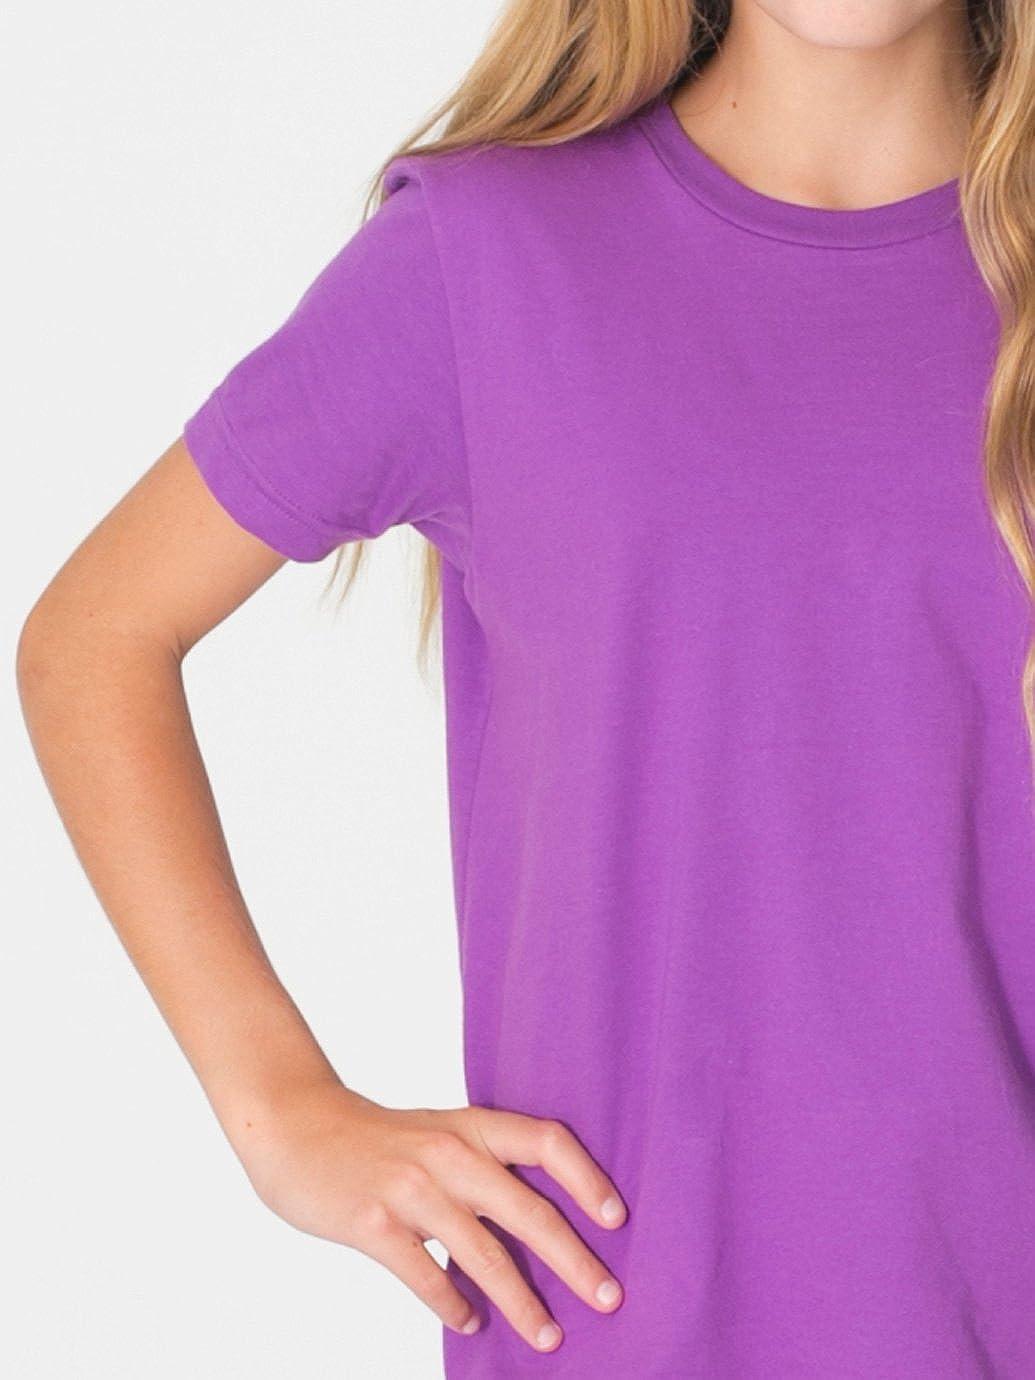 10 Years Black American Apparel Organic Youth Fine Jersey Short Sleeve T-Shirt